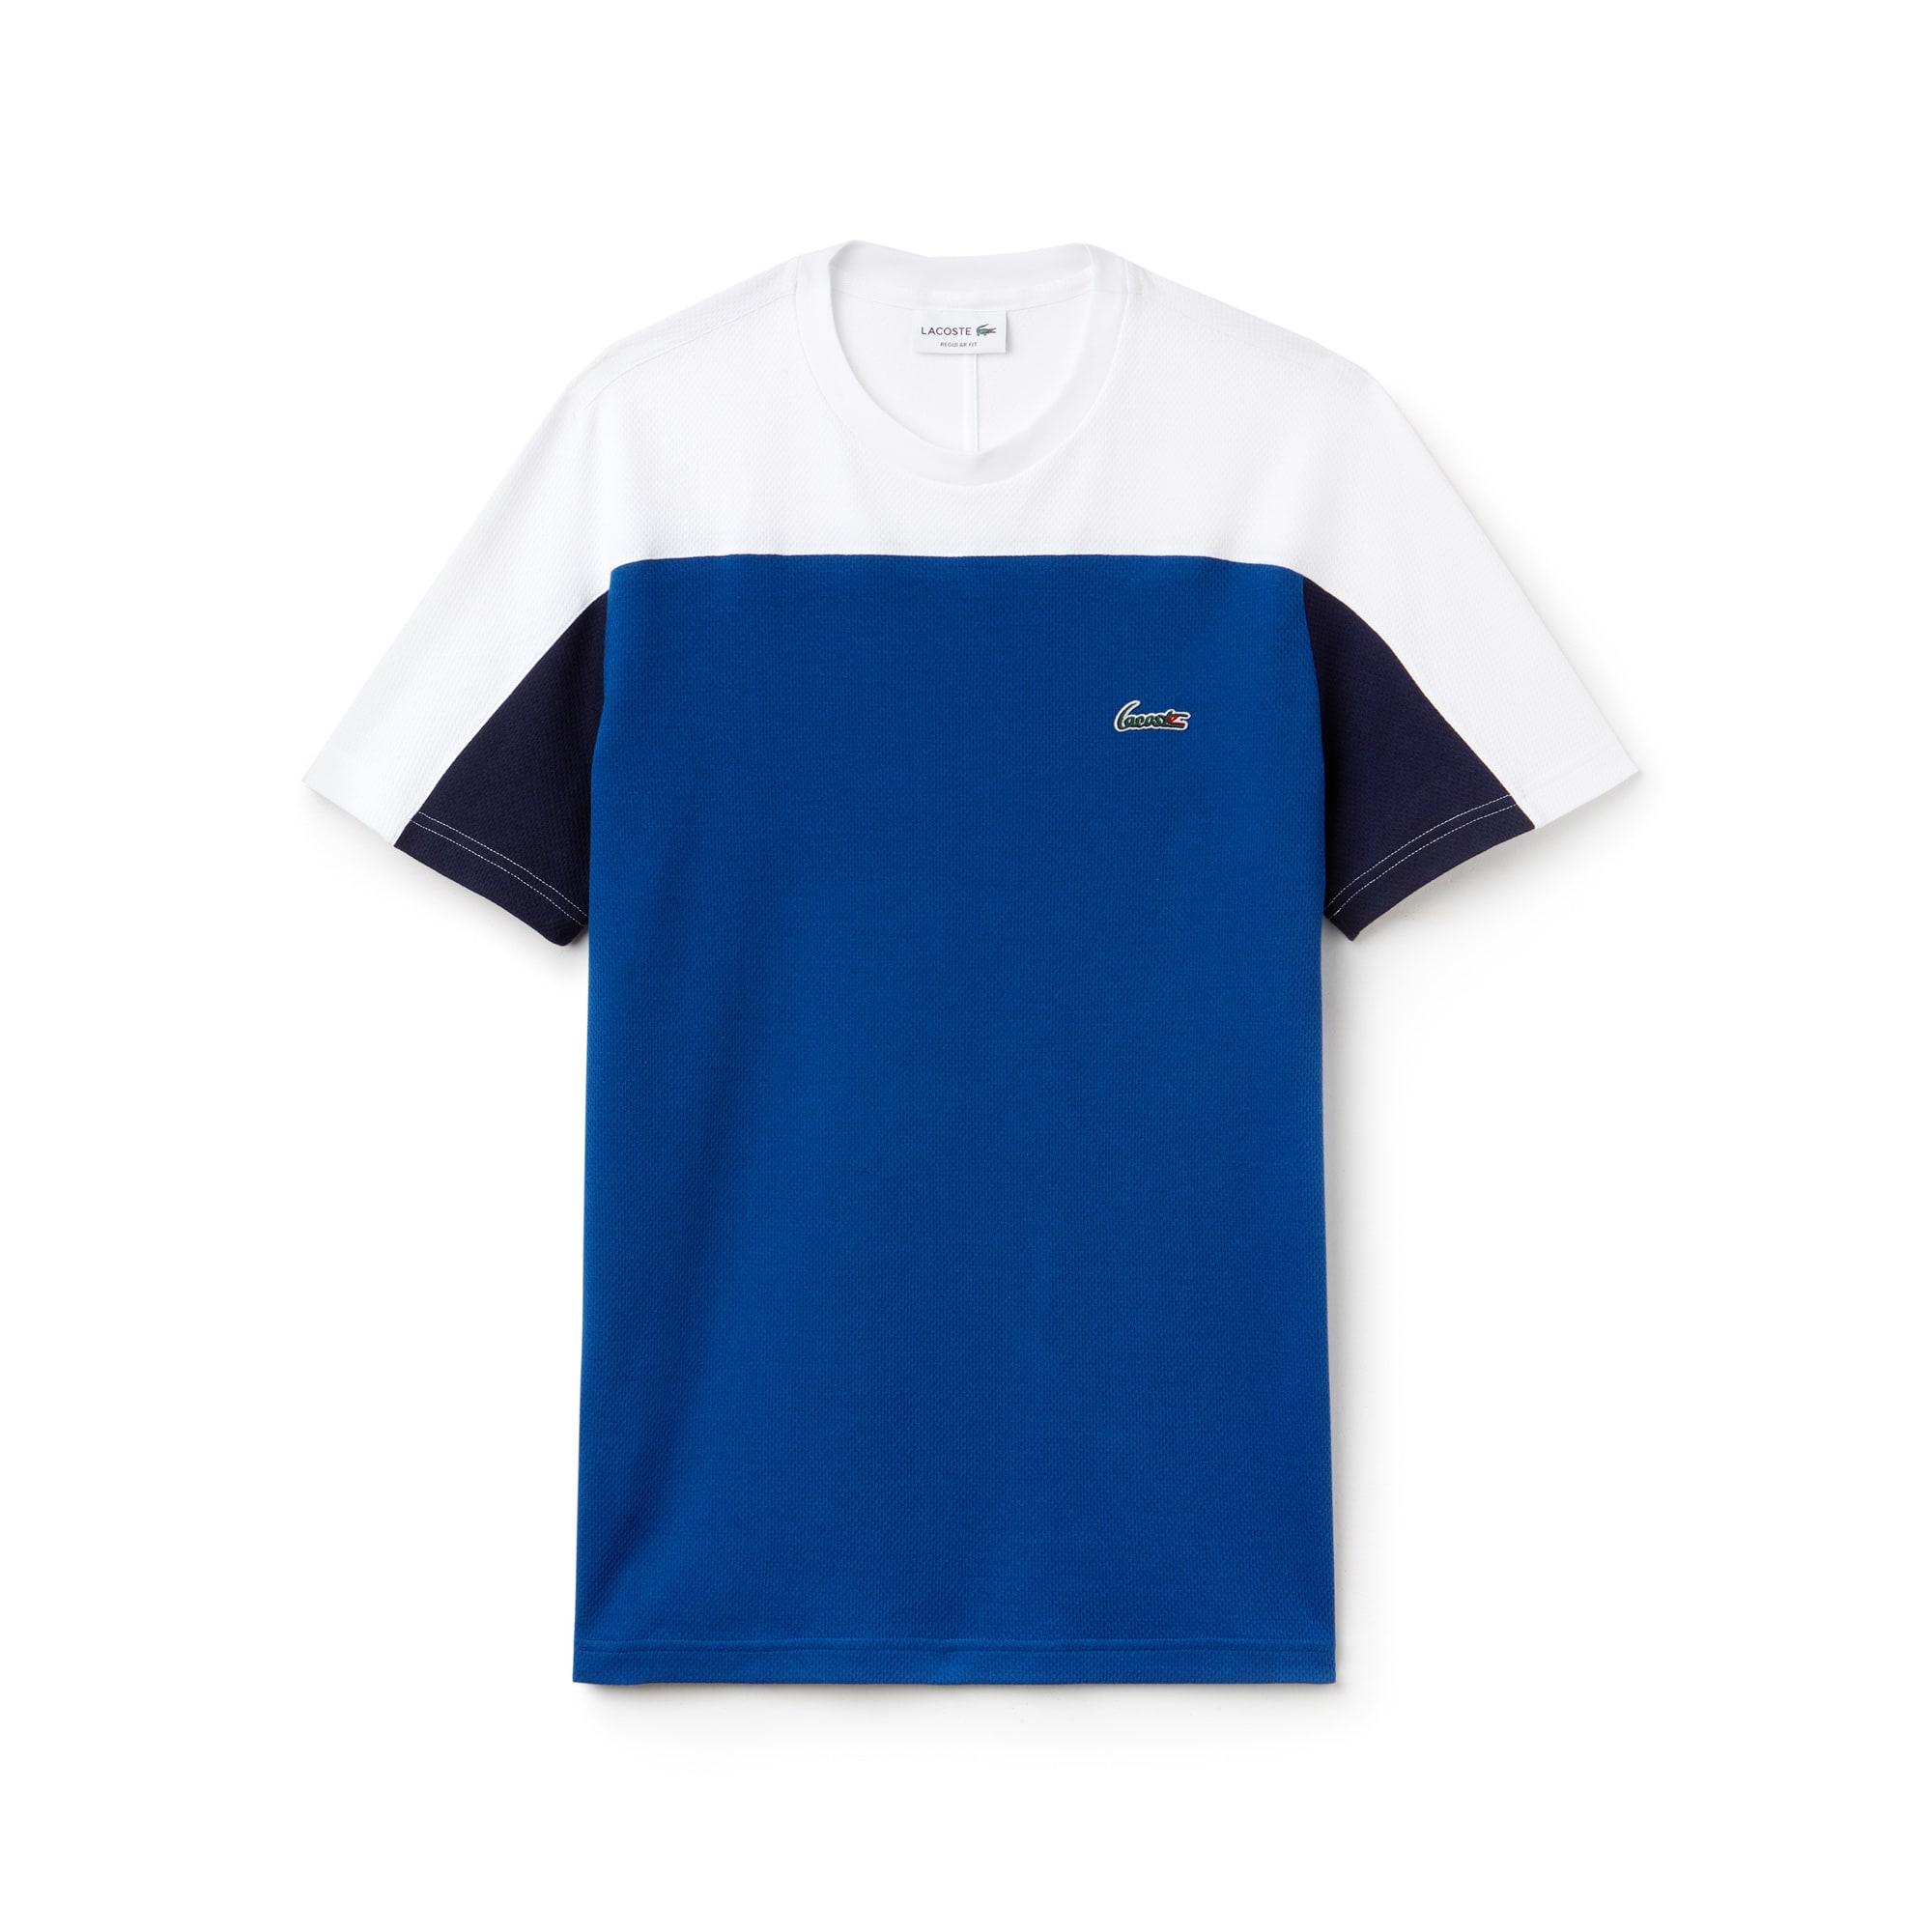 Herren Rundhals Mini-Baumwoll-Jacquard T-Shirt mit Colorblocks